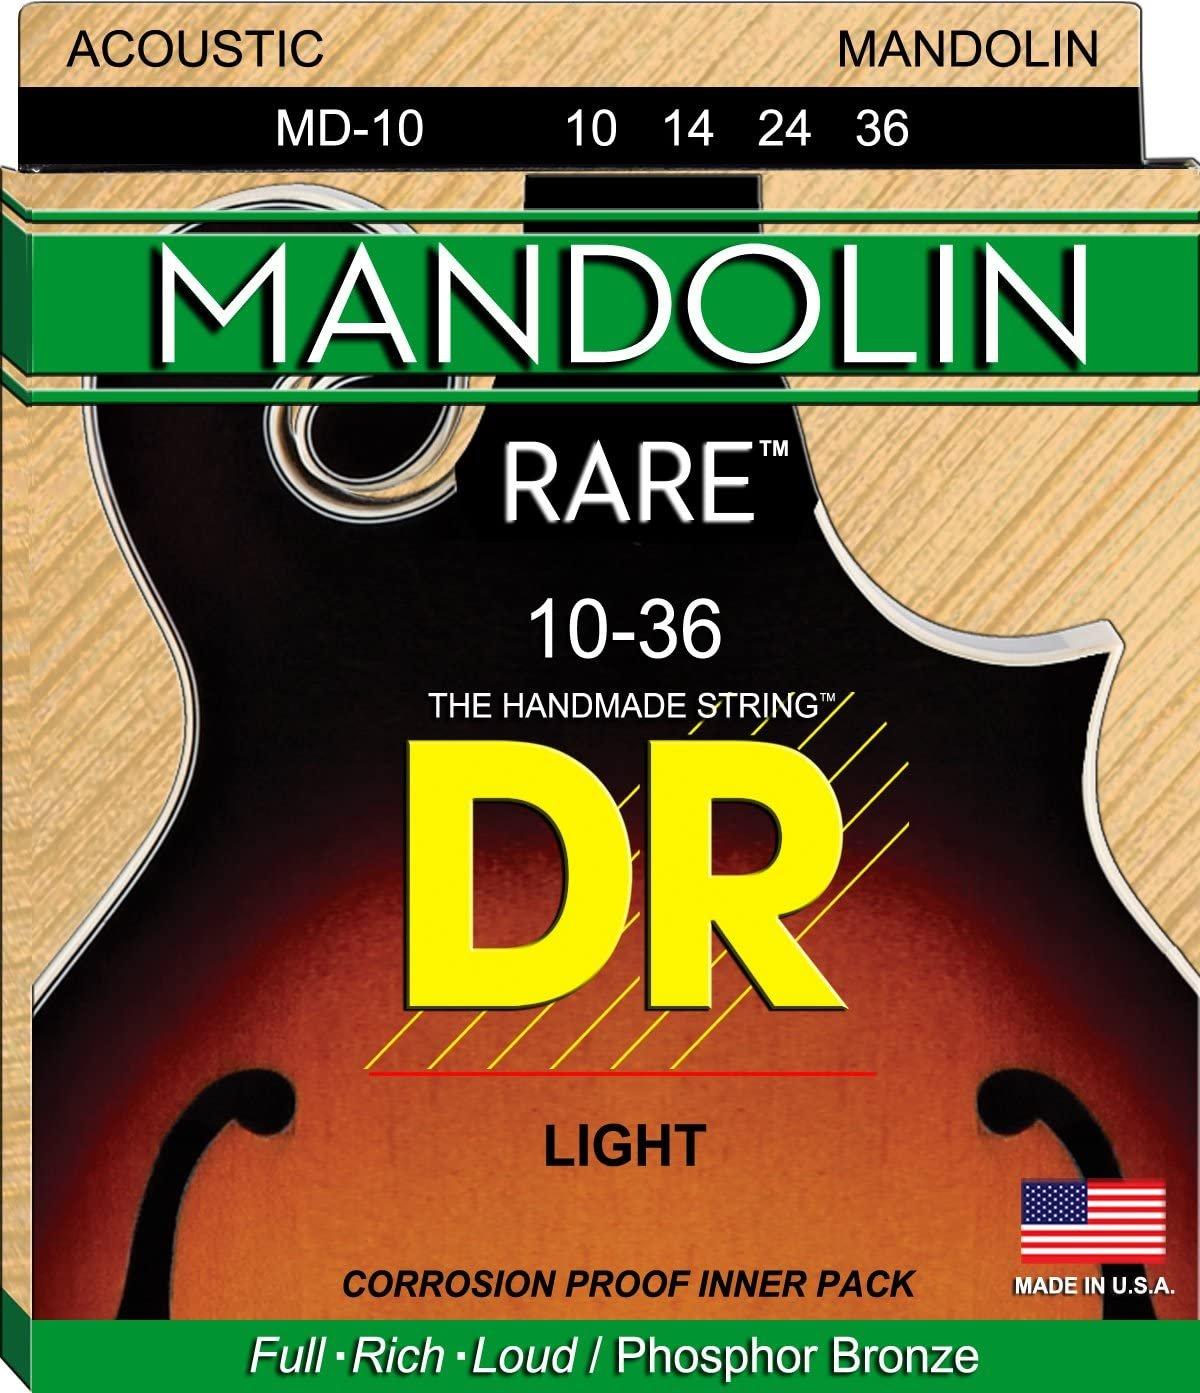 MD-10 Rare DR Strings 10-36